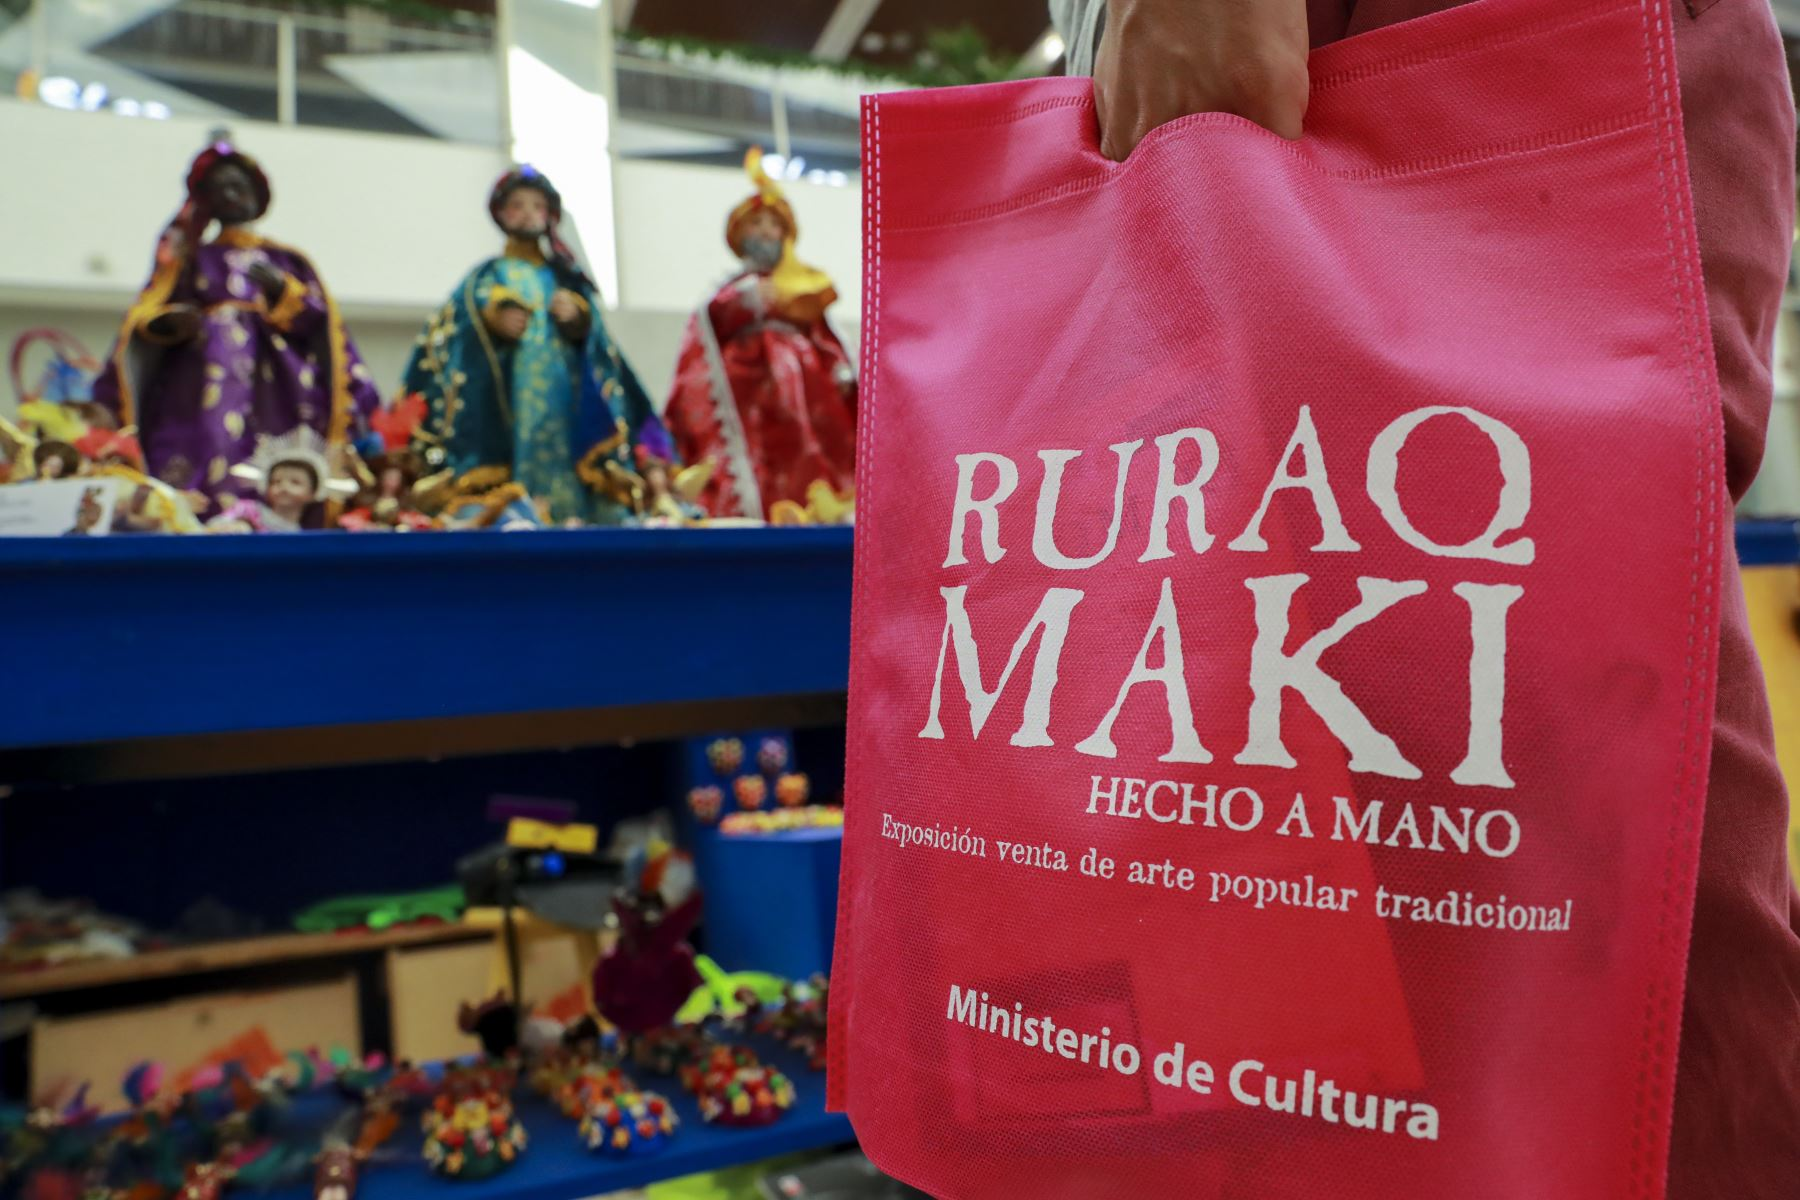 Ruraqmaki.pe expone en esta etapa de pandemia en las plataformas digitales. ANDINA/Carla Patiño Ramírez